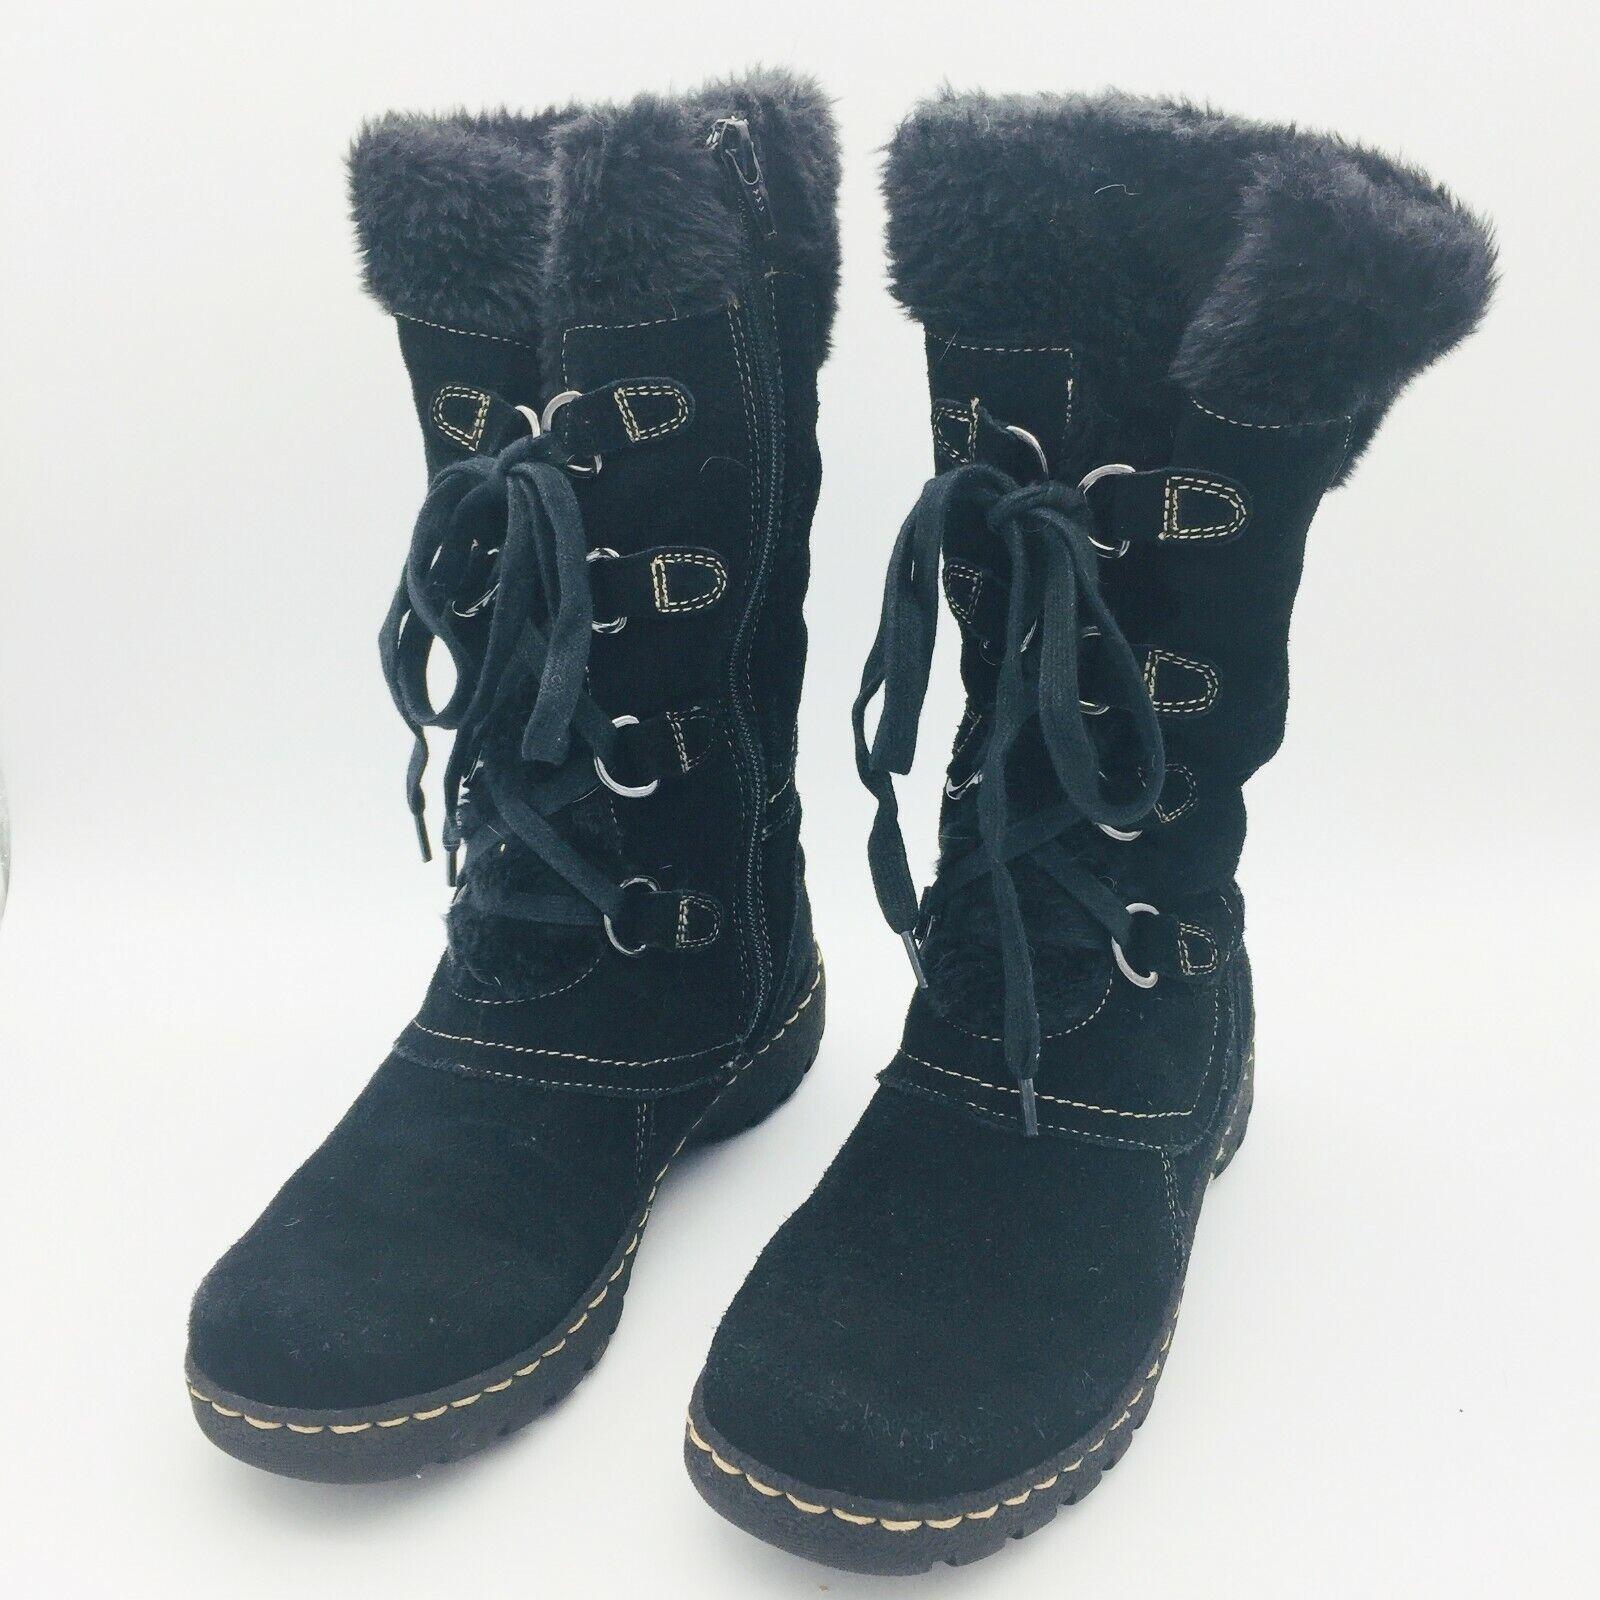 Bare Traps Black Leather \u0026 Faux Fur